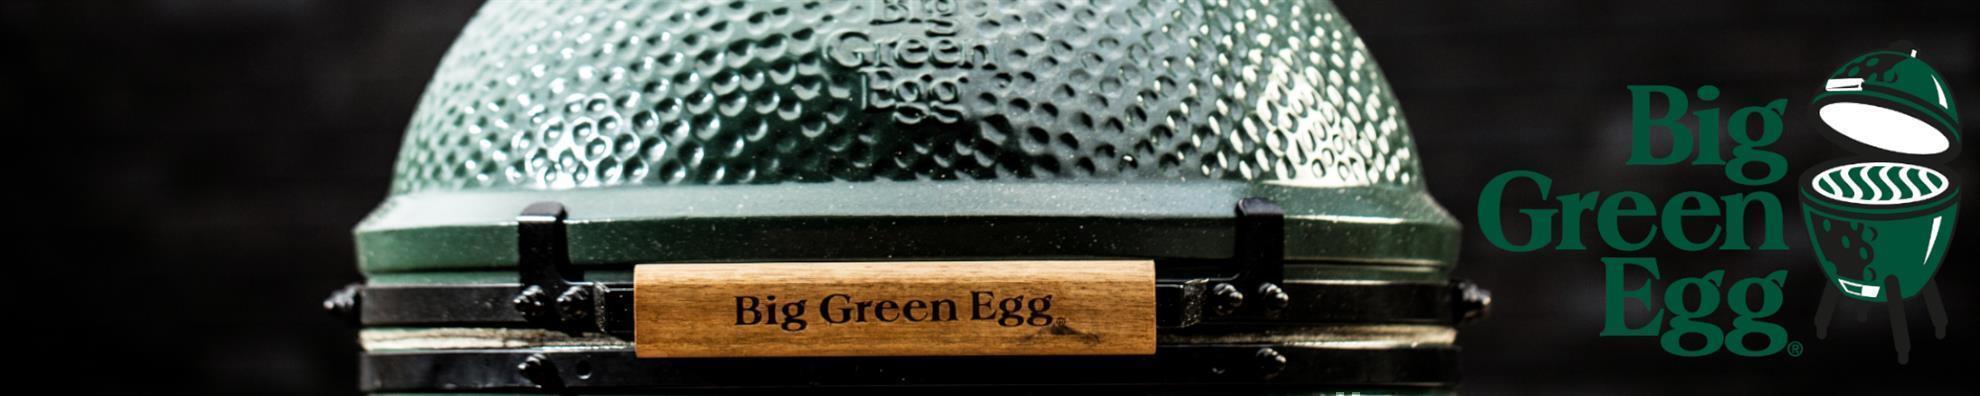 Big Green Egg - Starter-Set XLarge  inkl. Nest, convEGGtor, Holzkohle 4,5Kg, Grillanzünder, Ascheschieber